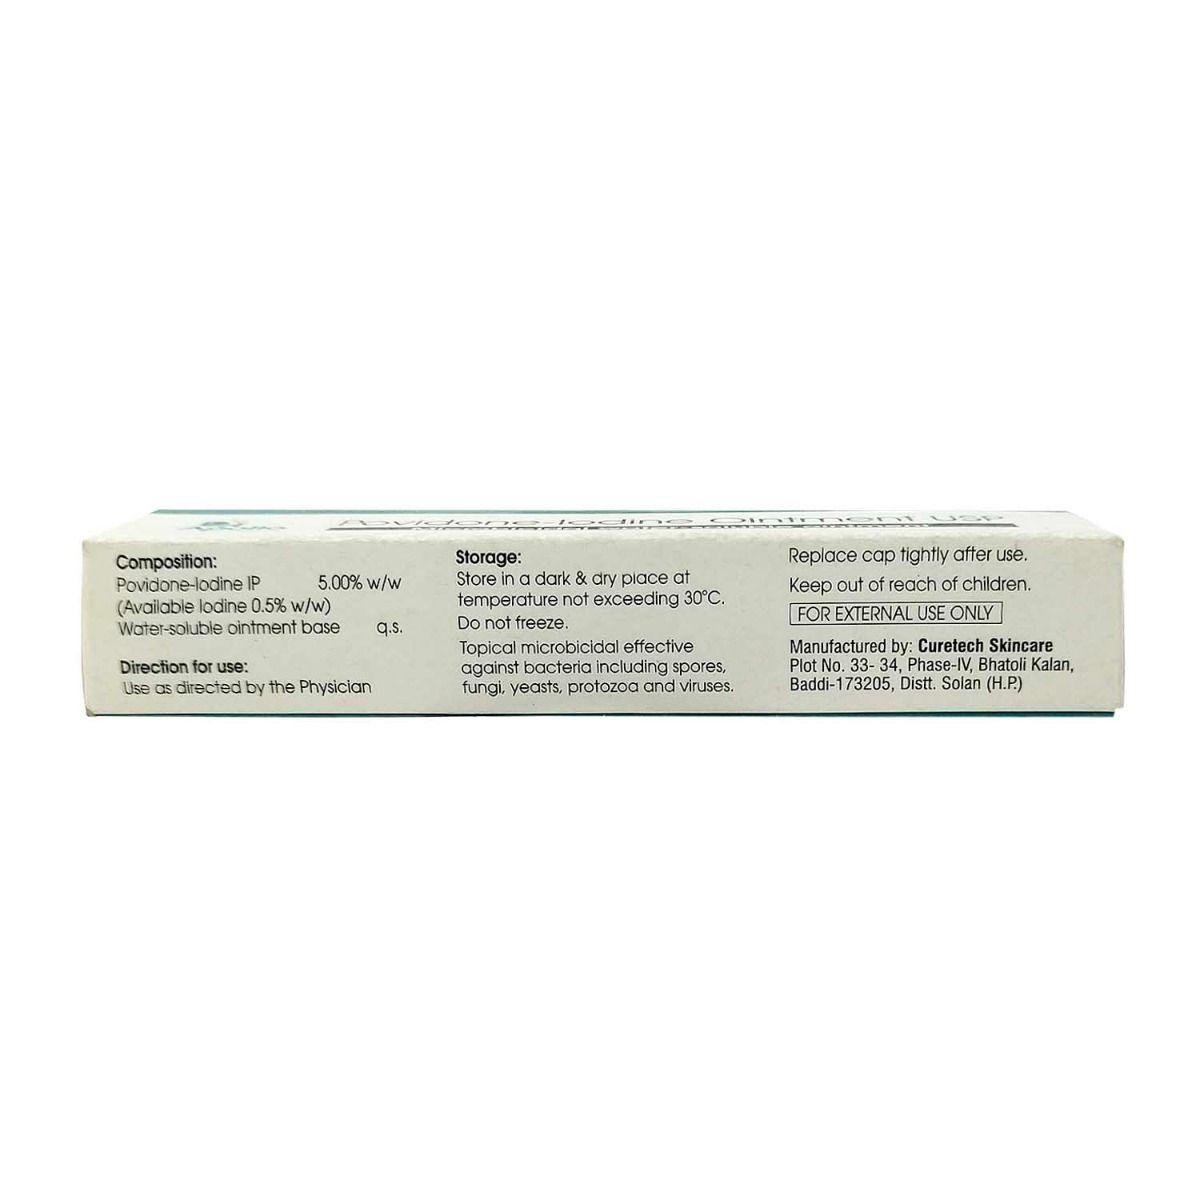 Apollo Pharmacy Povidone-Iodine Ointment USP, 20 gm, Pack of 1